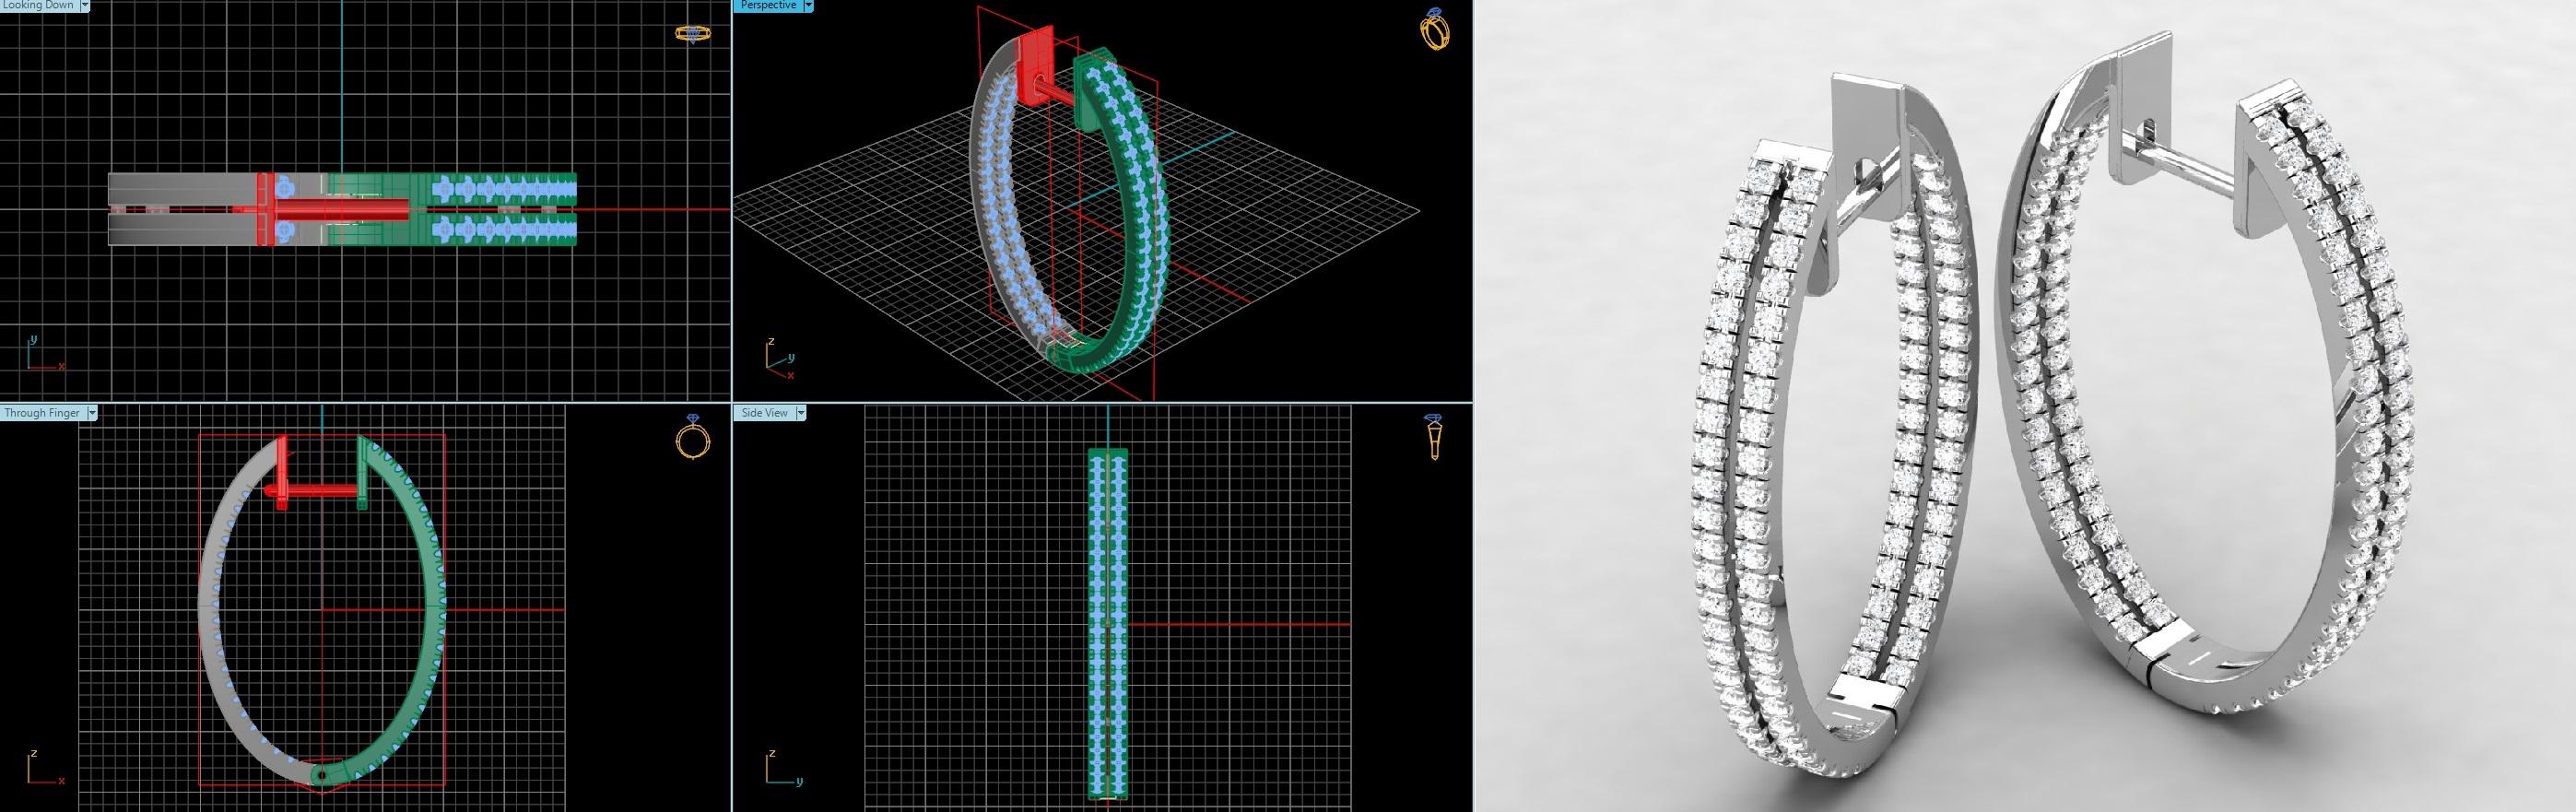 Custom Designs using Cad Cam Technology Jewelry Design Gallery